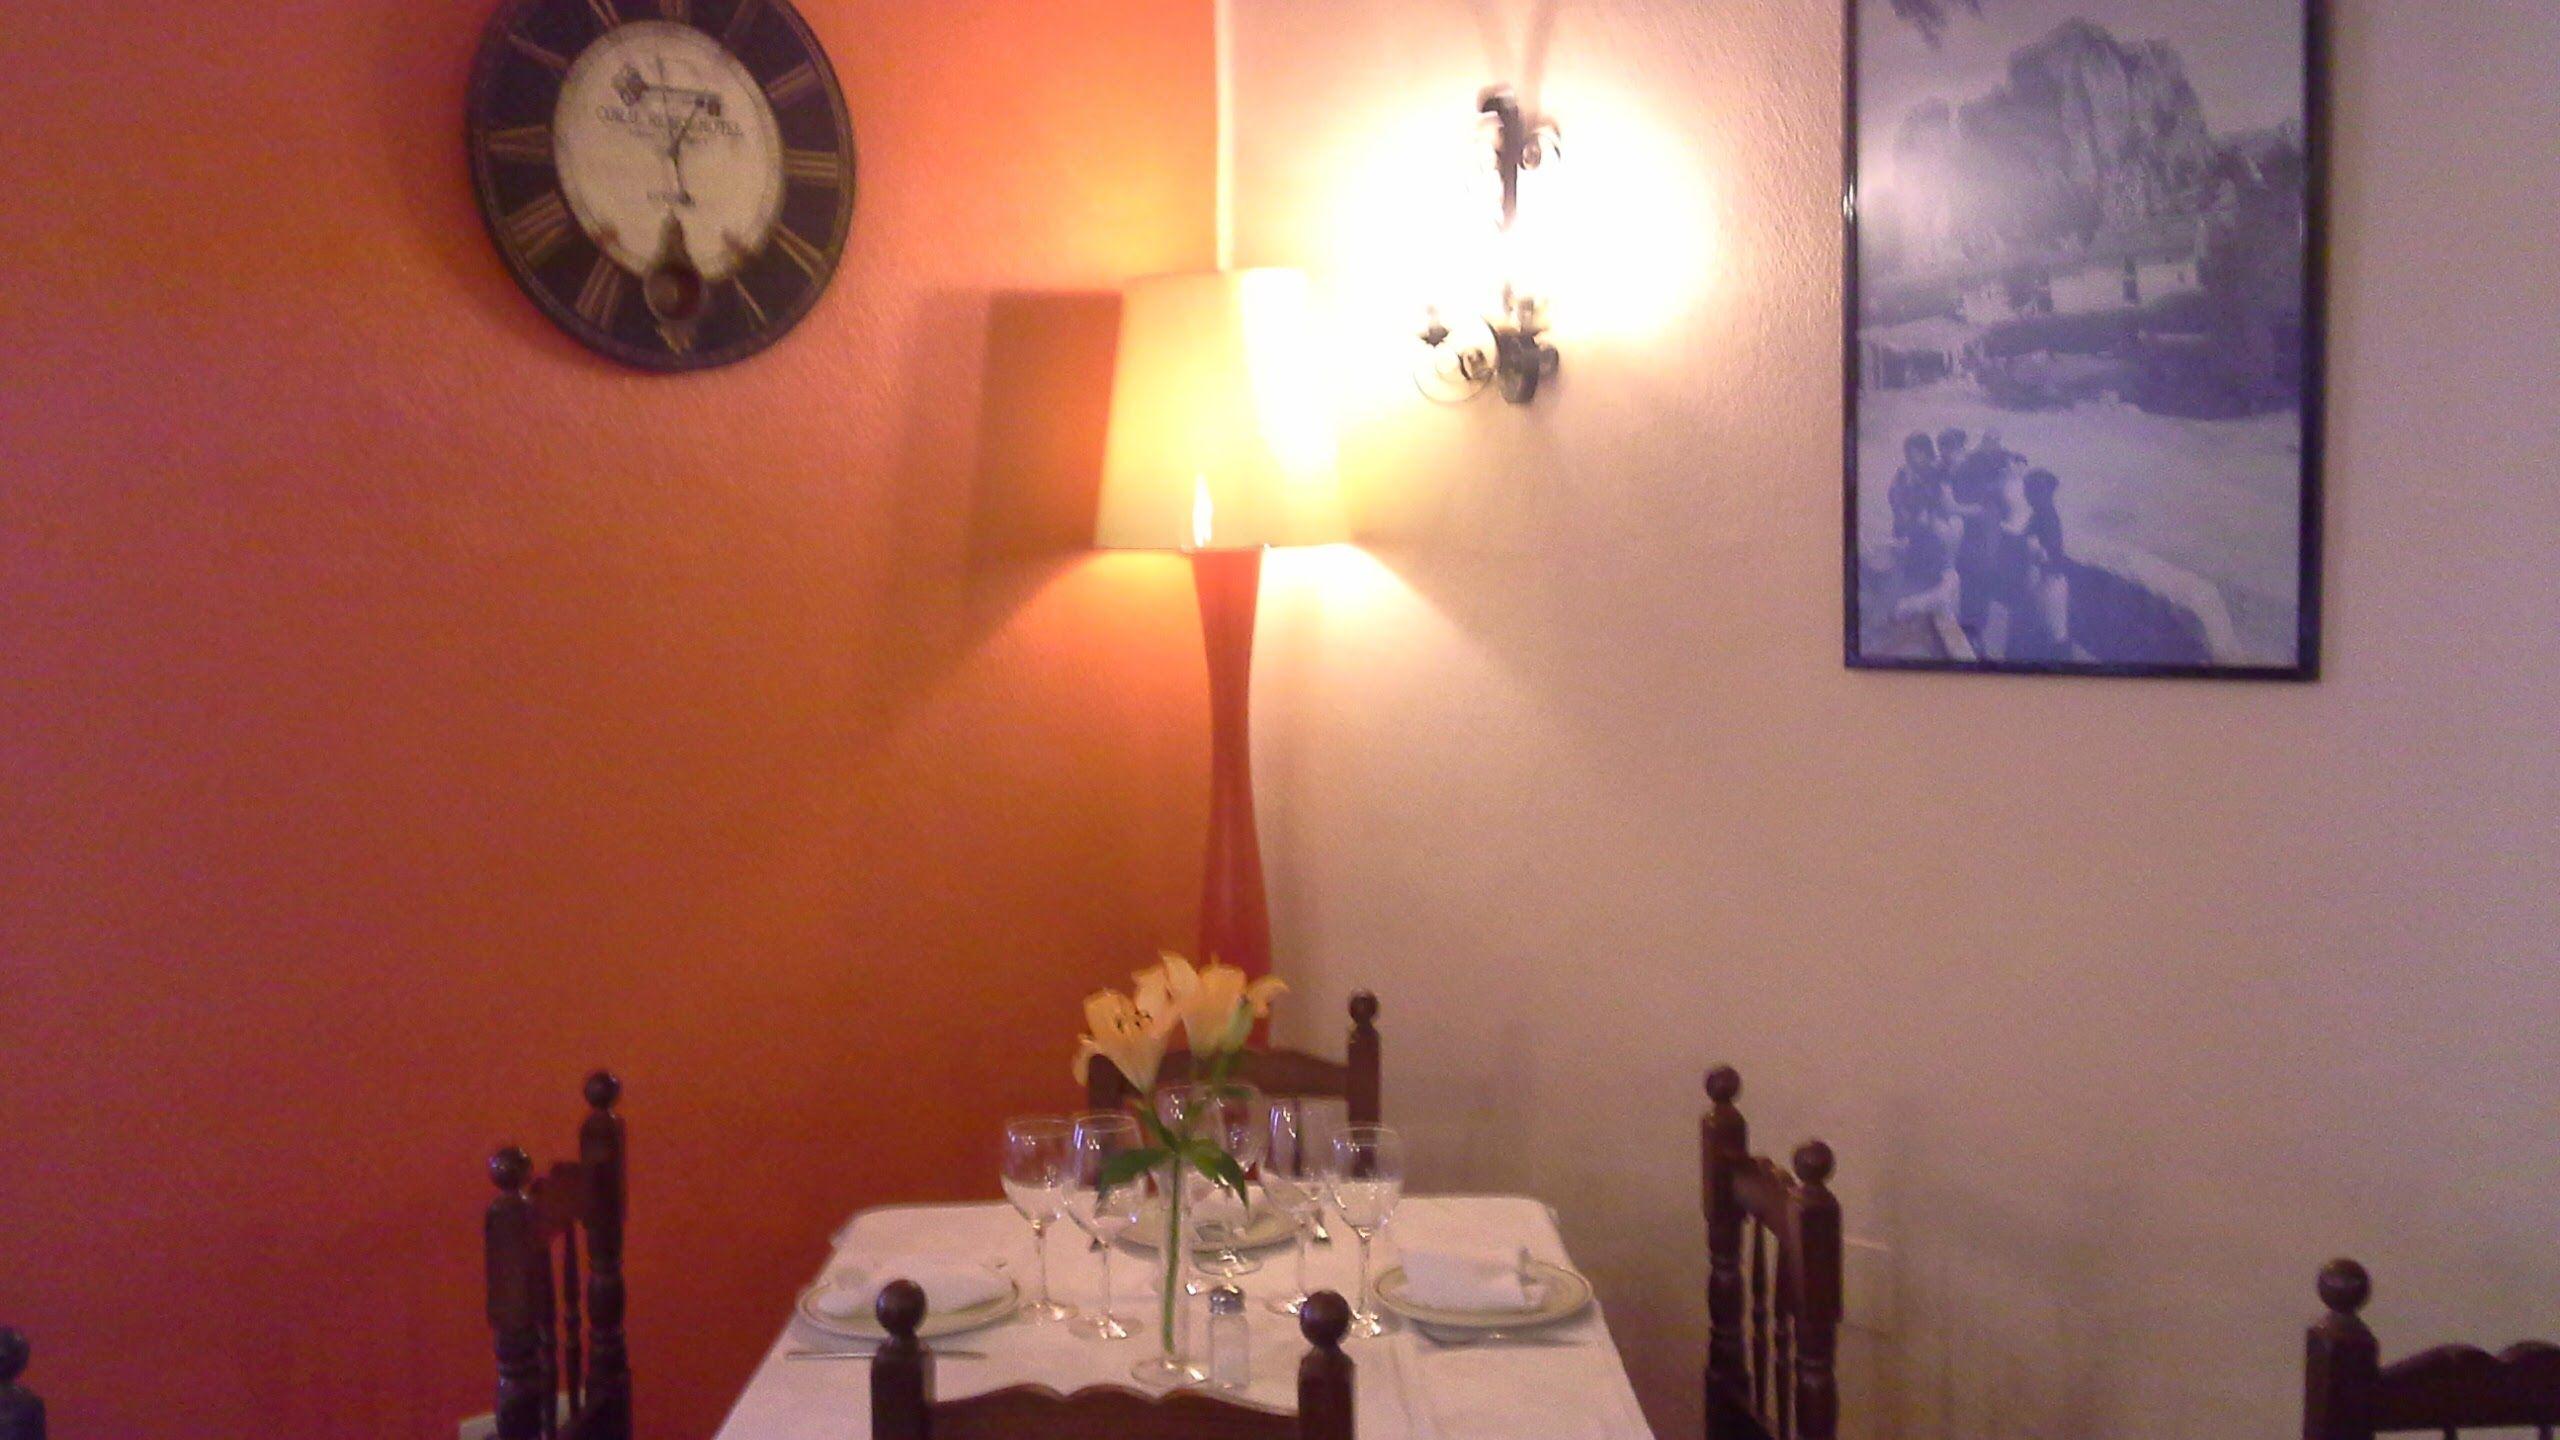 Foto 17 de Mesón - restaurante en Benimantell | Mesón Ca Rafel